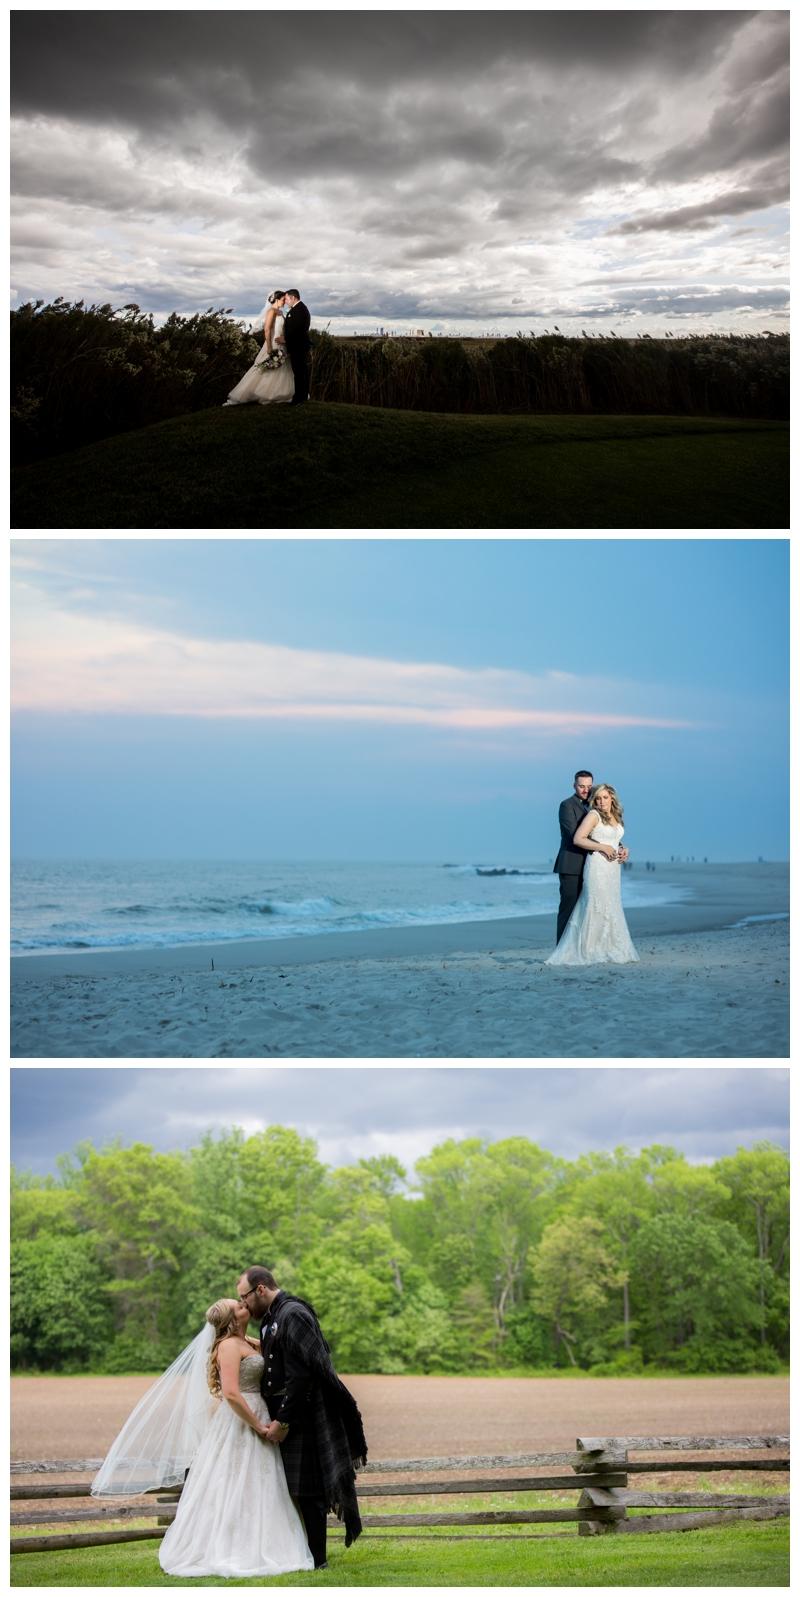 styled-pink-photography-rainy-wedding-day.jpg